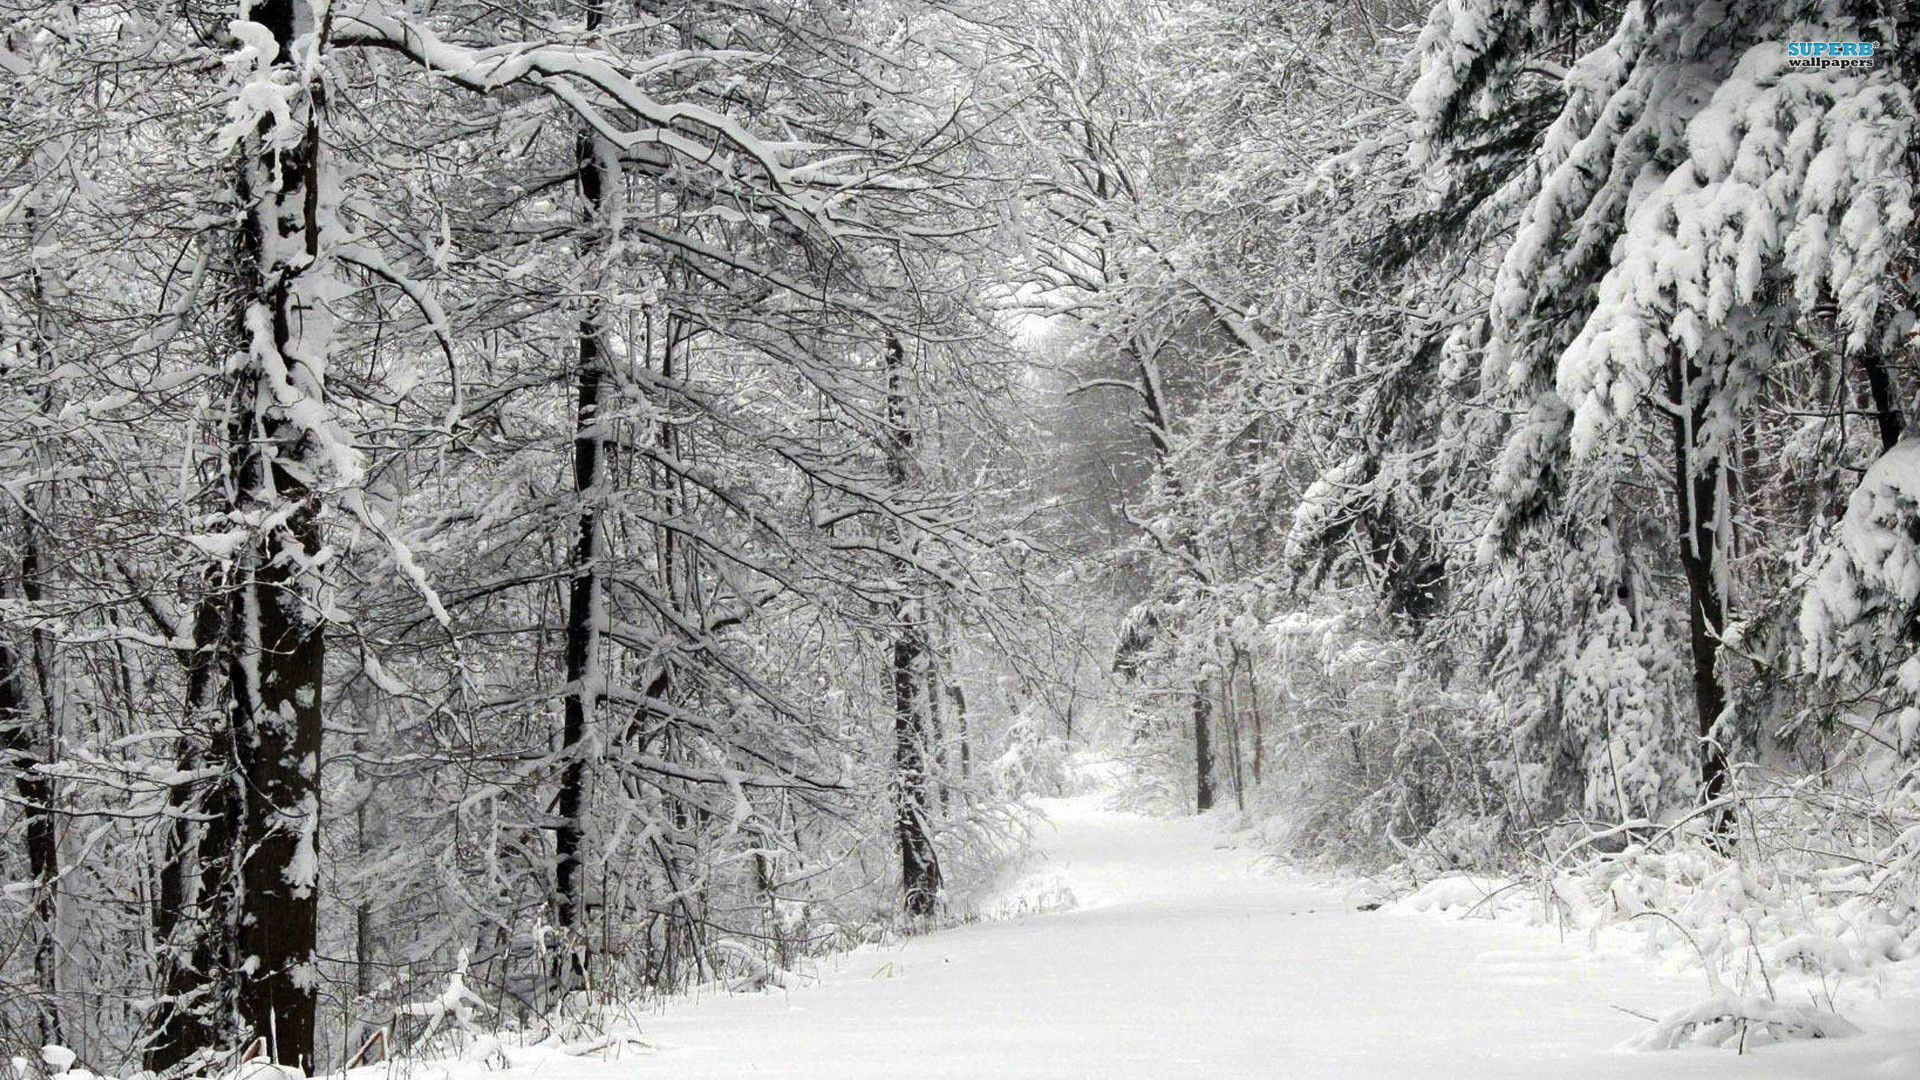 001_-_Wintery_Forest.jpg